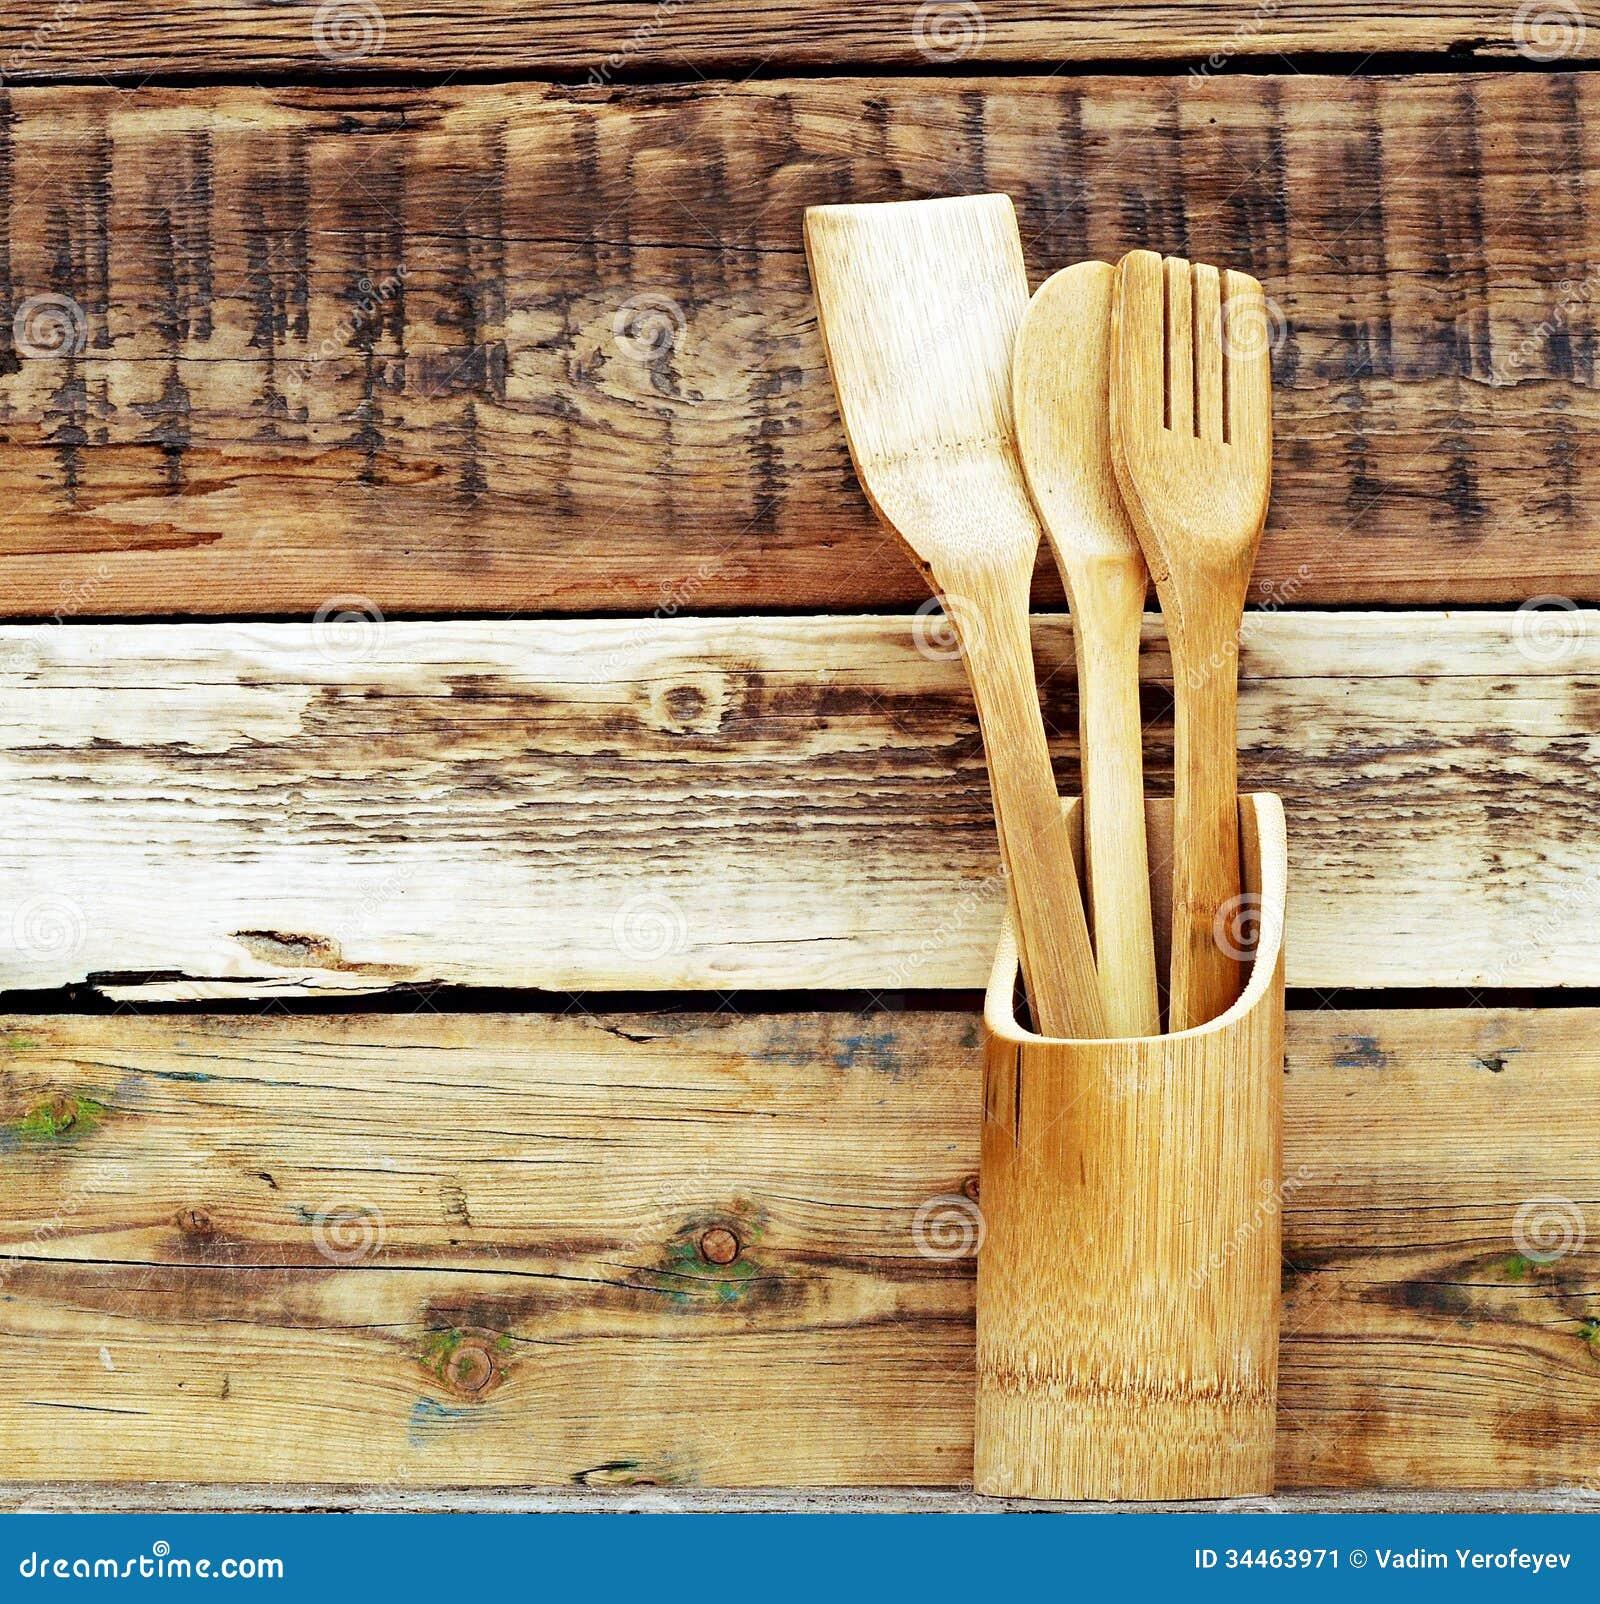 Kitchen Background Image: Kitchen Wooden Utensils Stock Image. Image Of Spatula